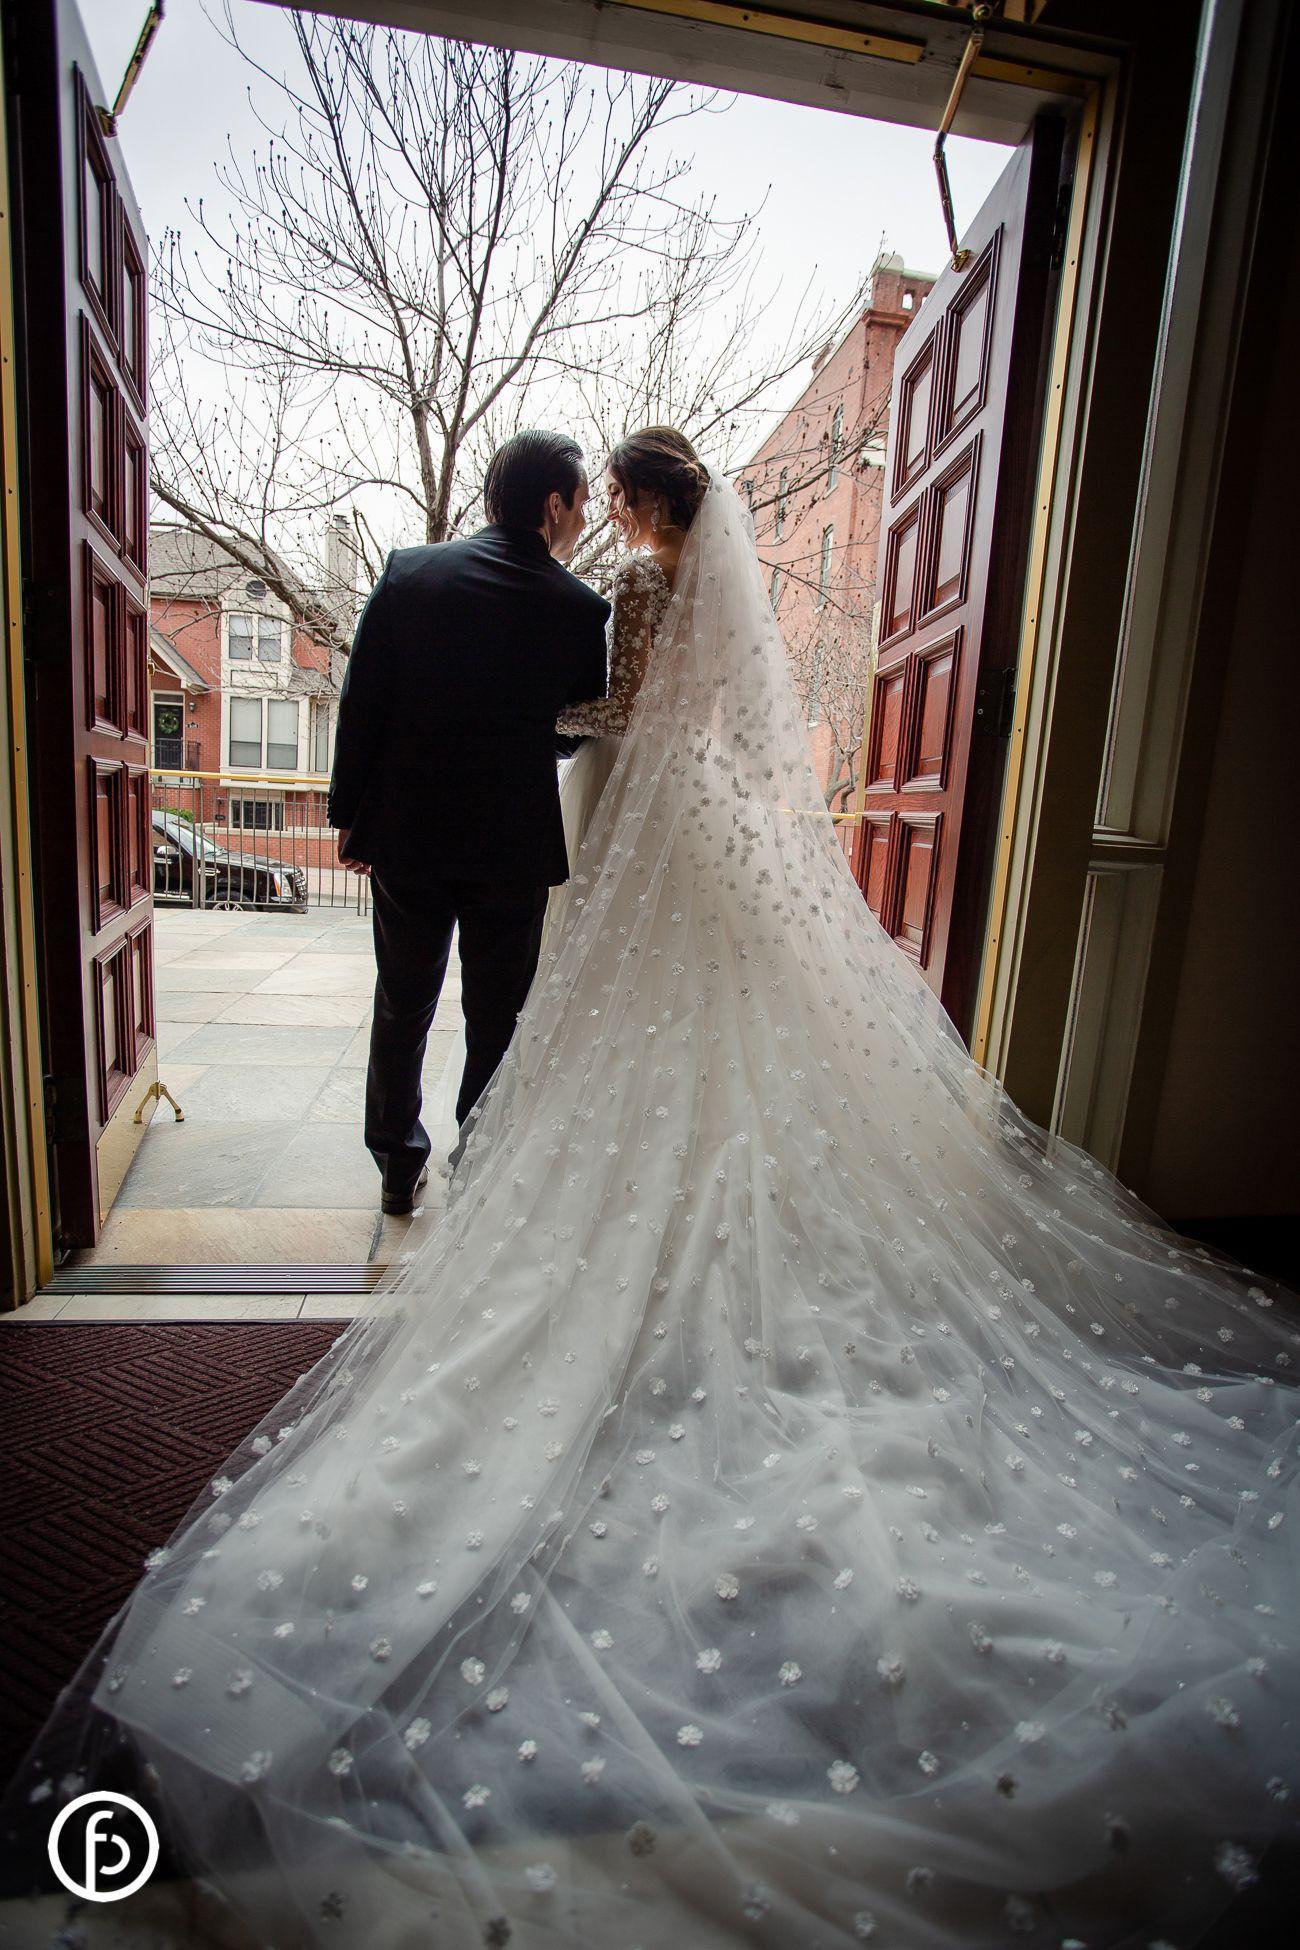 kansas city wedding, long train dress, long veil